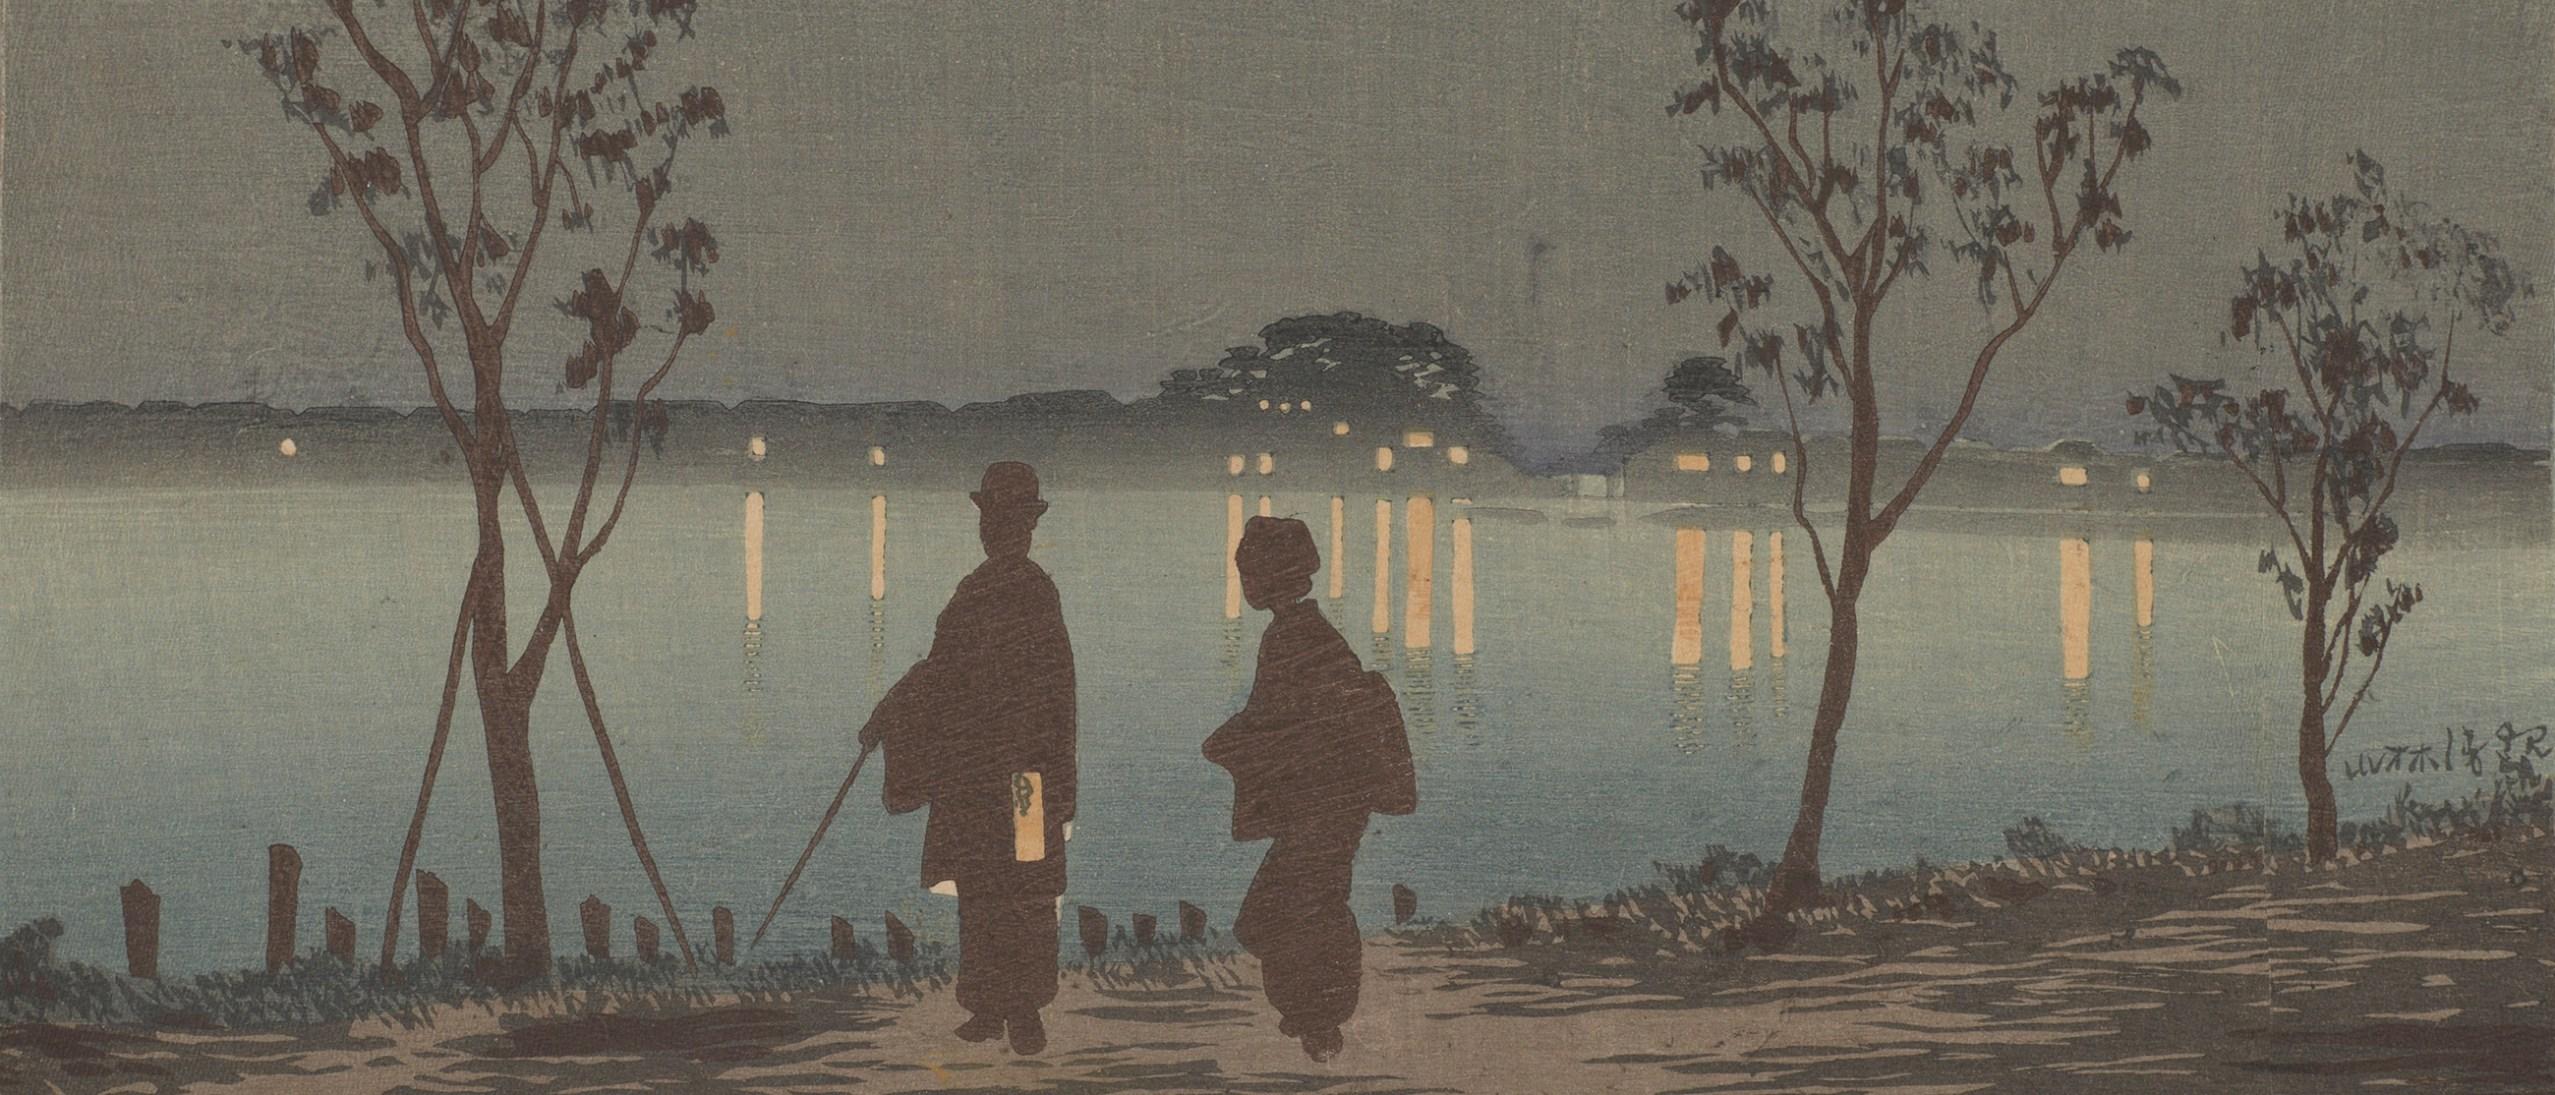 Detail image, Sumida River by Night 隅田川夜, Kobayashi Kiyochika; Japan, 1881; Woodblock print; ink and color on paper; Robert O. Muller Collection; S2003.8.1203